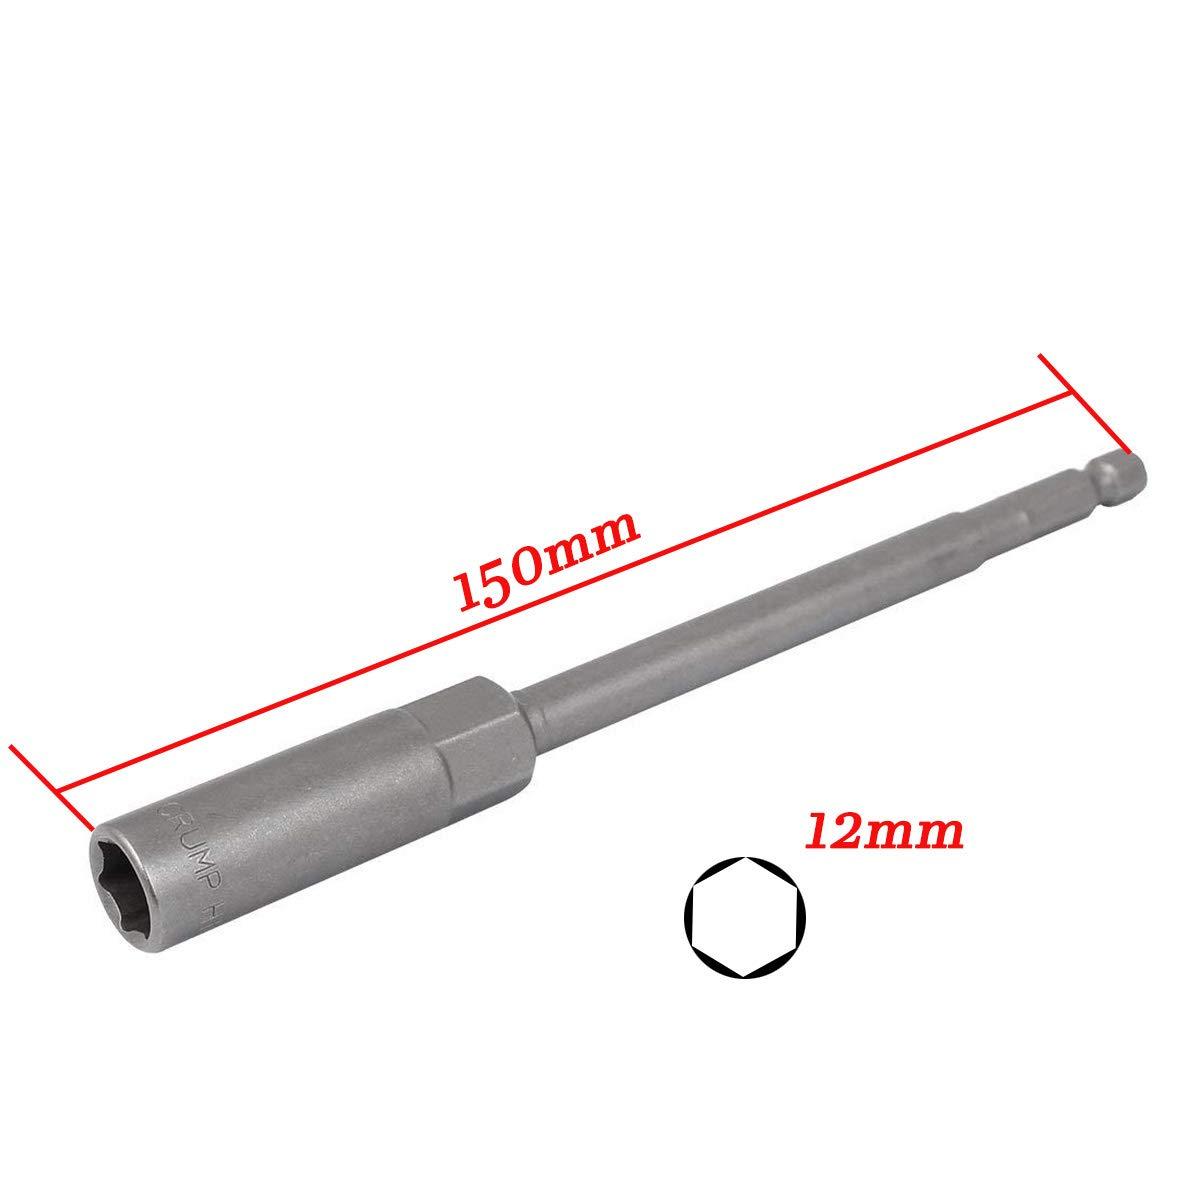 XMHF Gray Metal Screwdriver Drill 150mm/×8mm Hex Socket Nut Driver Set Hexagonal Deep Socket Nut Driver 3Pcs